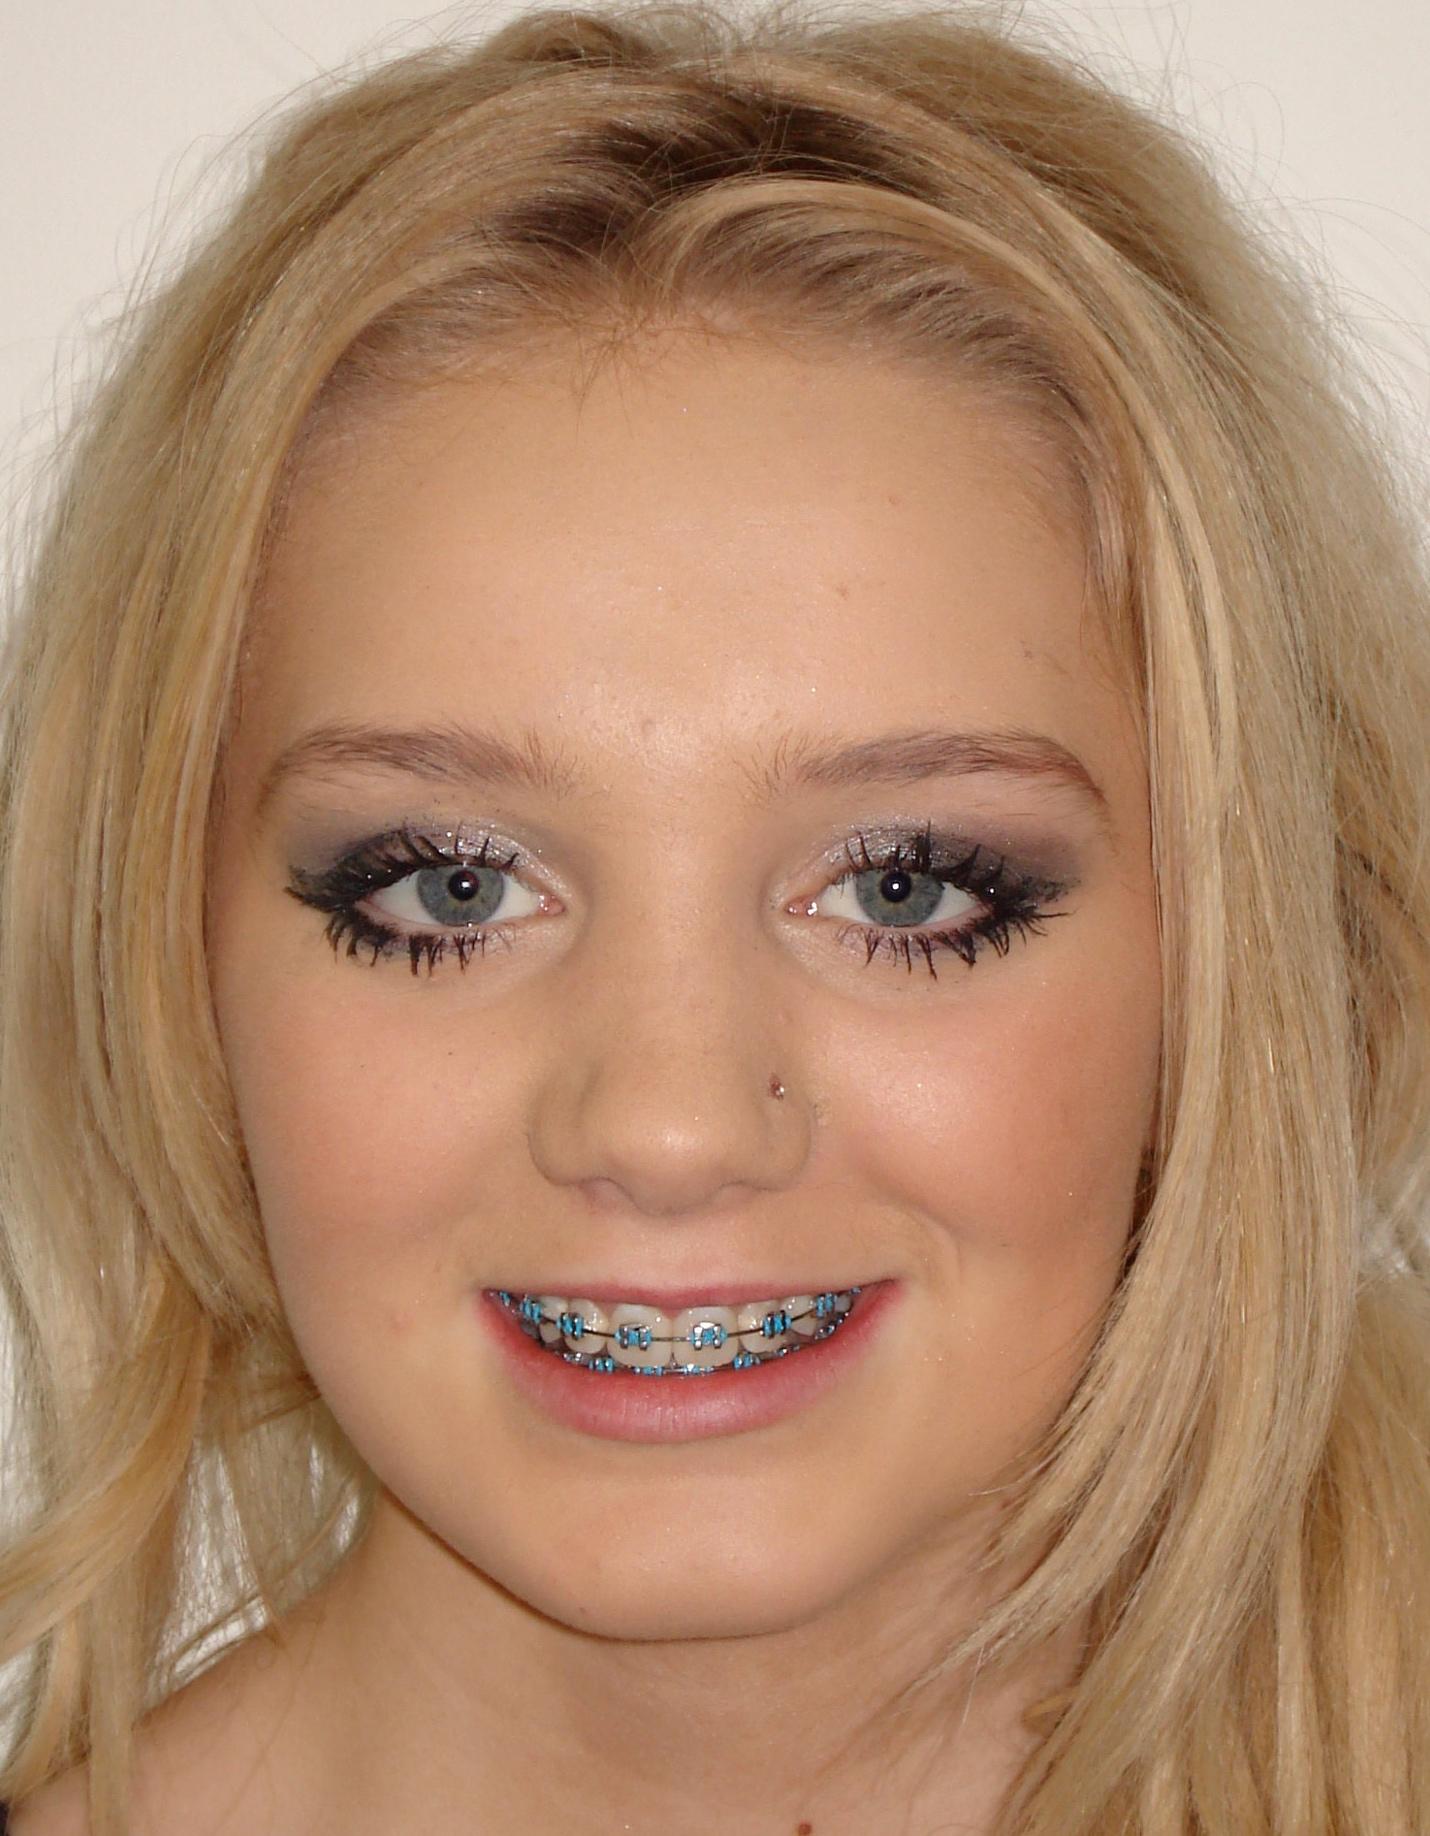 metal braces transformation after